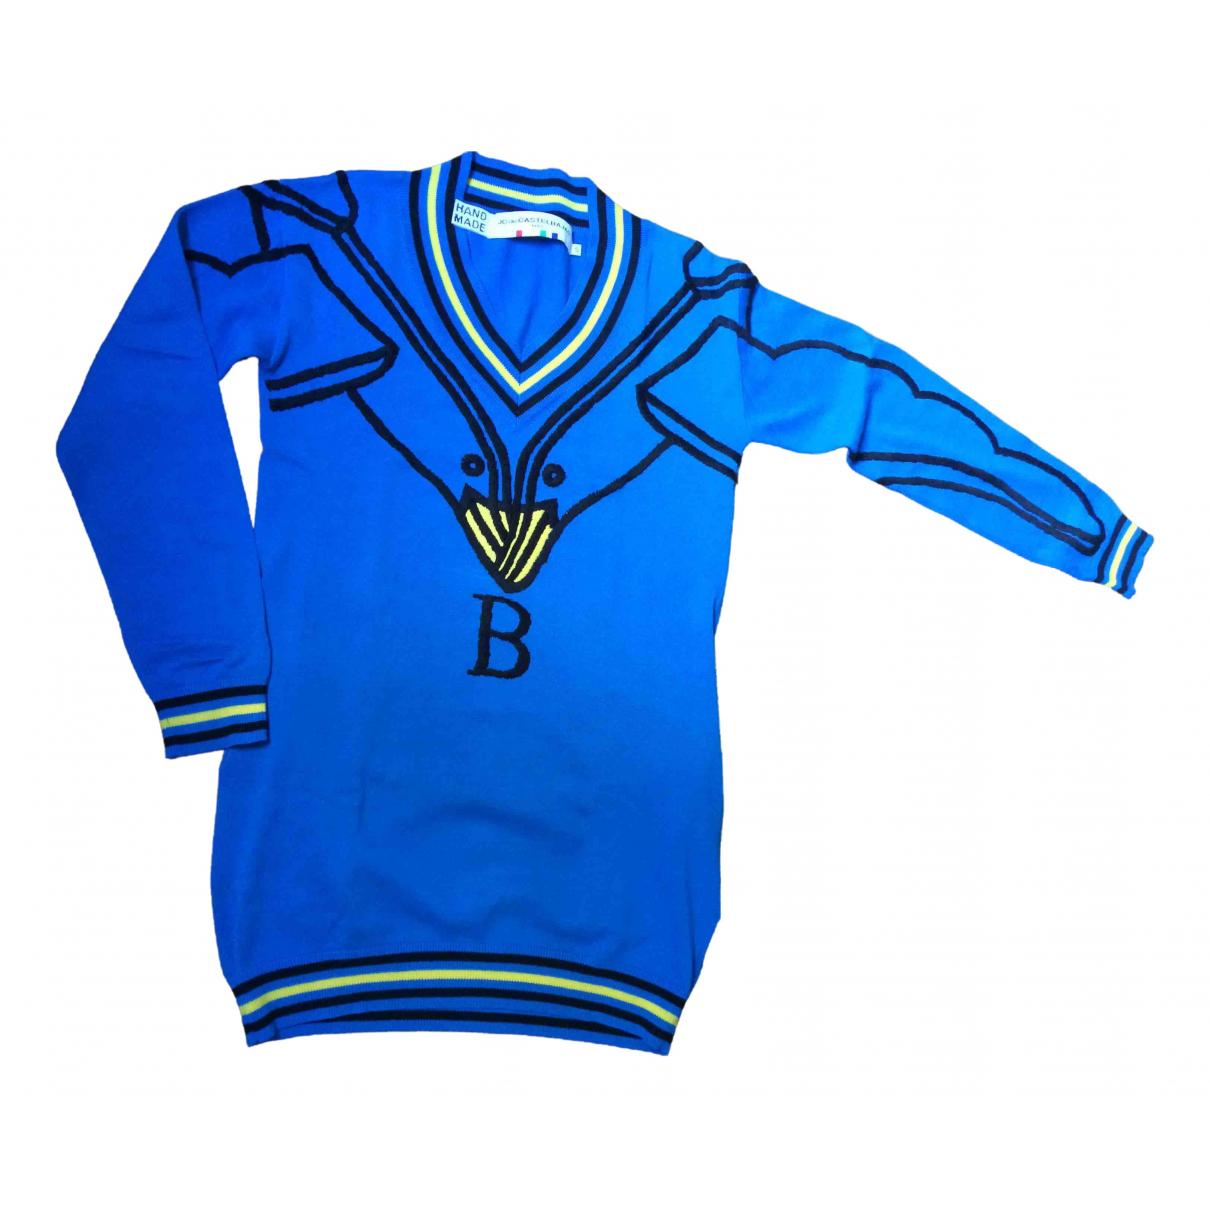 Jc De Castelbajac \N Kleid in  Blau Baumwolle